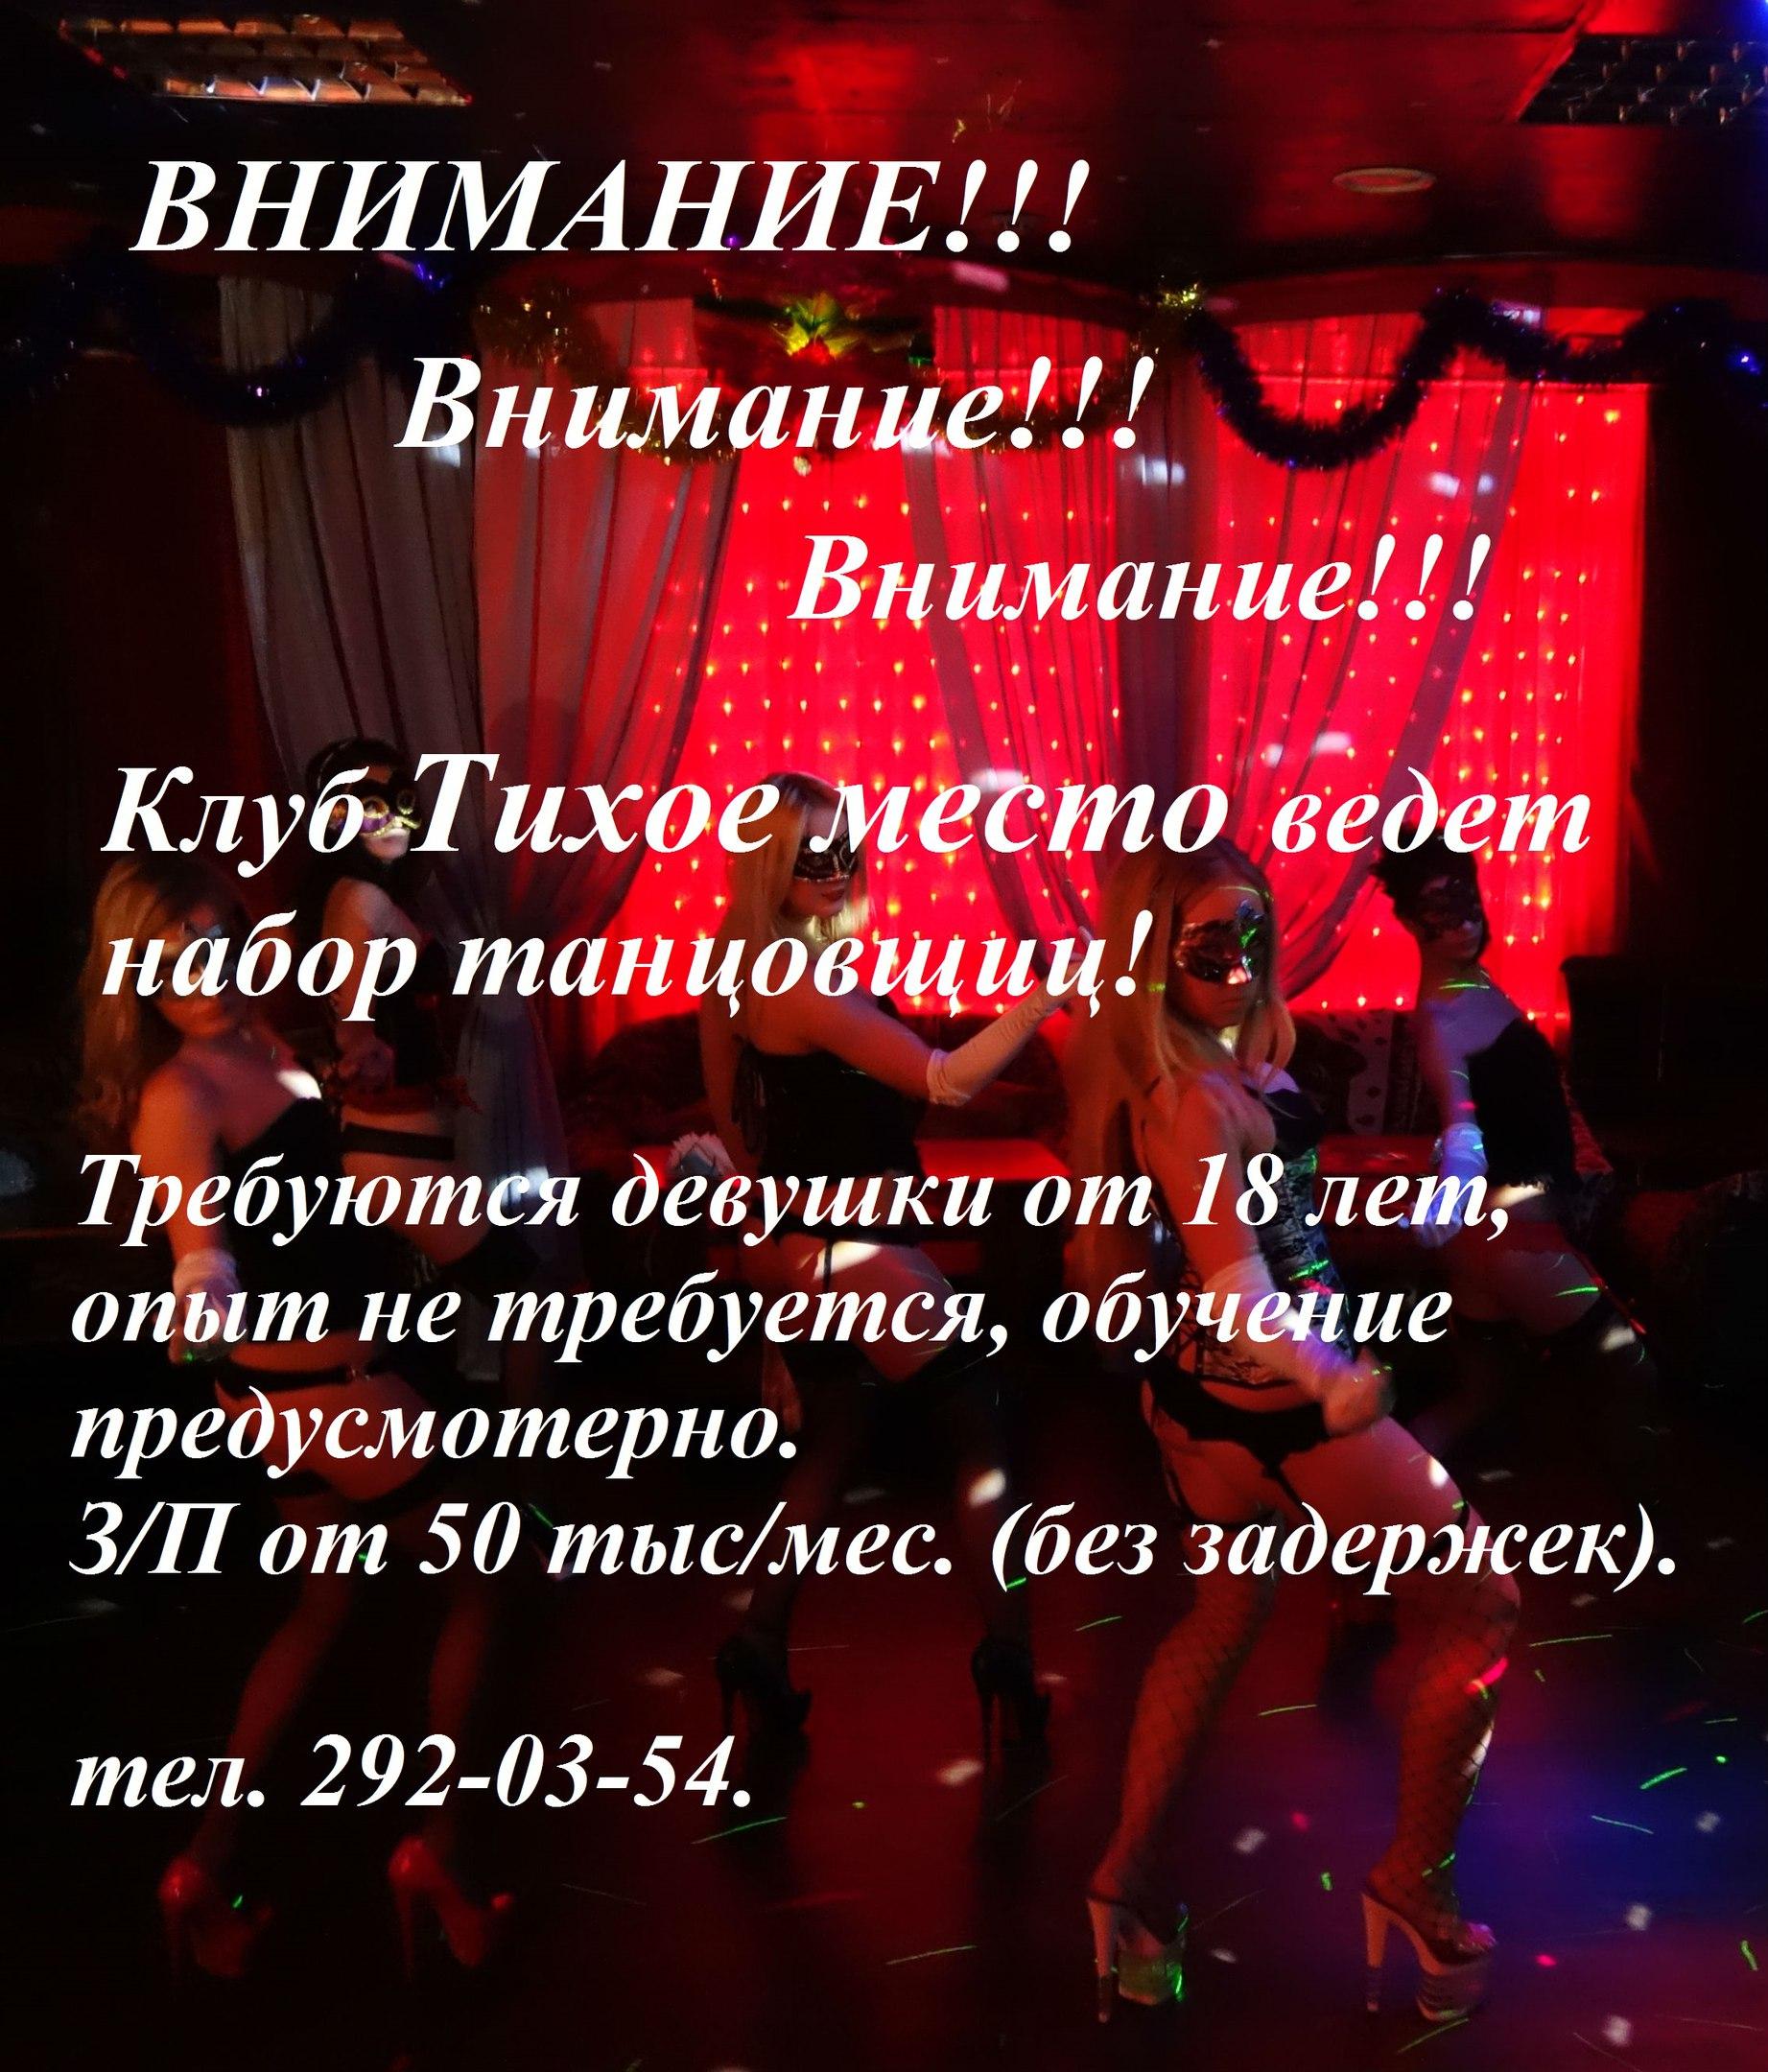 Стриптиз-клуб «Тихое место» - Вконтакте